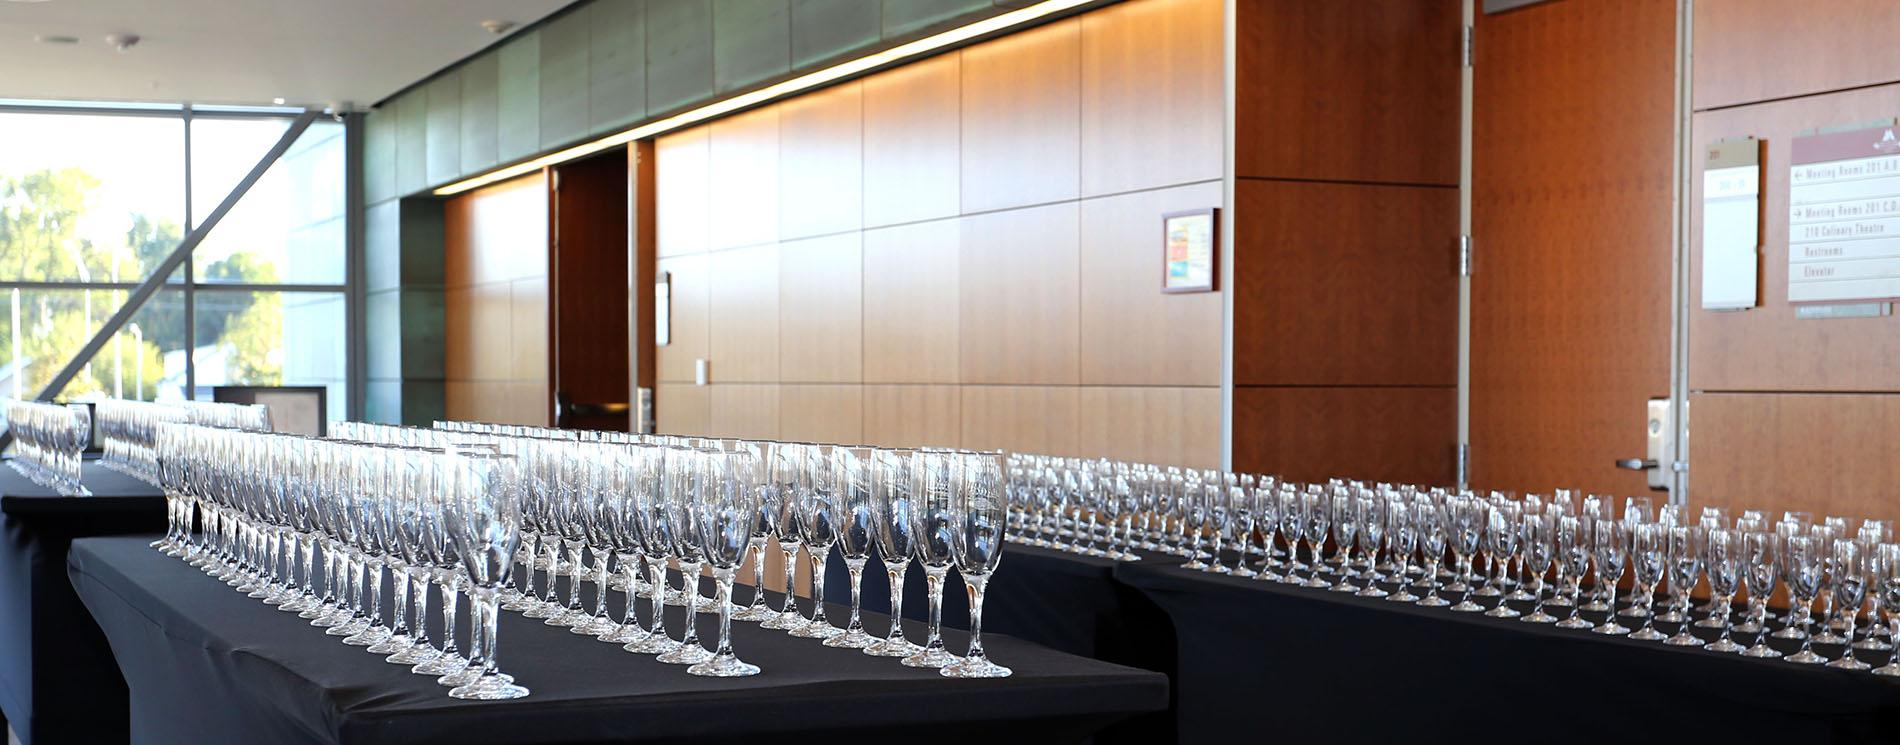 Omaha Hospitality Hall of Fame